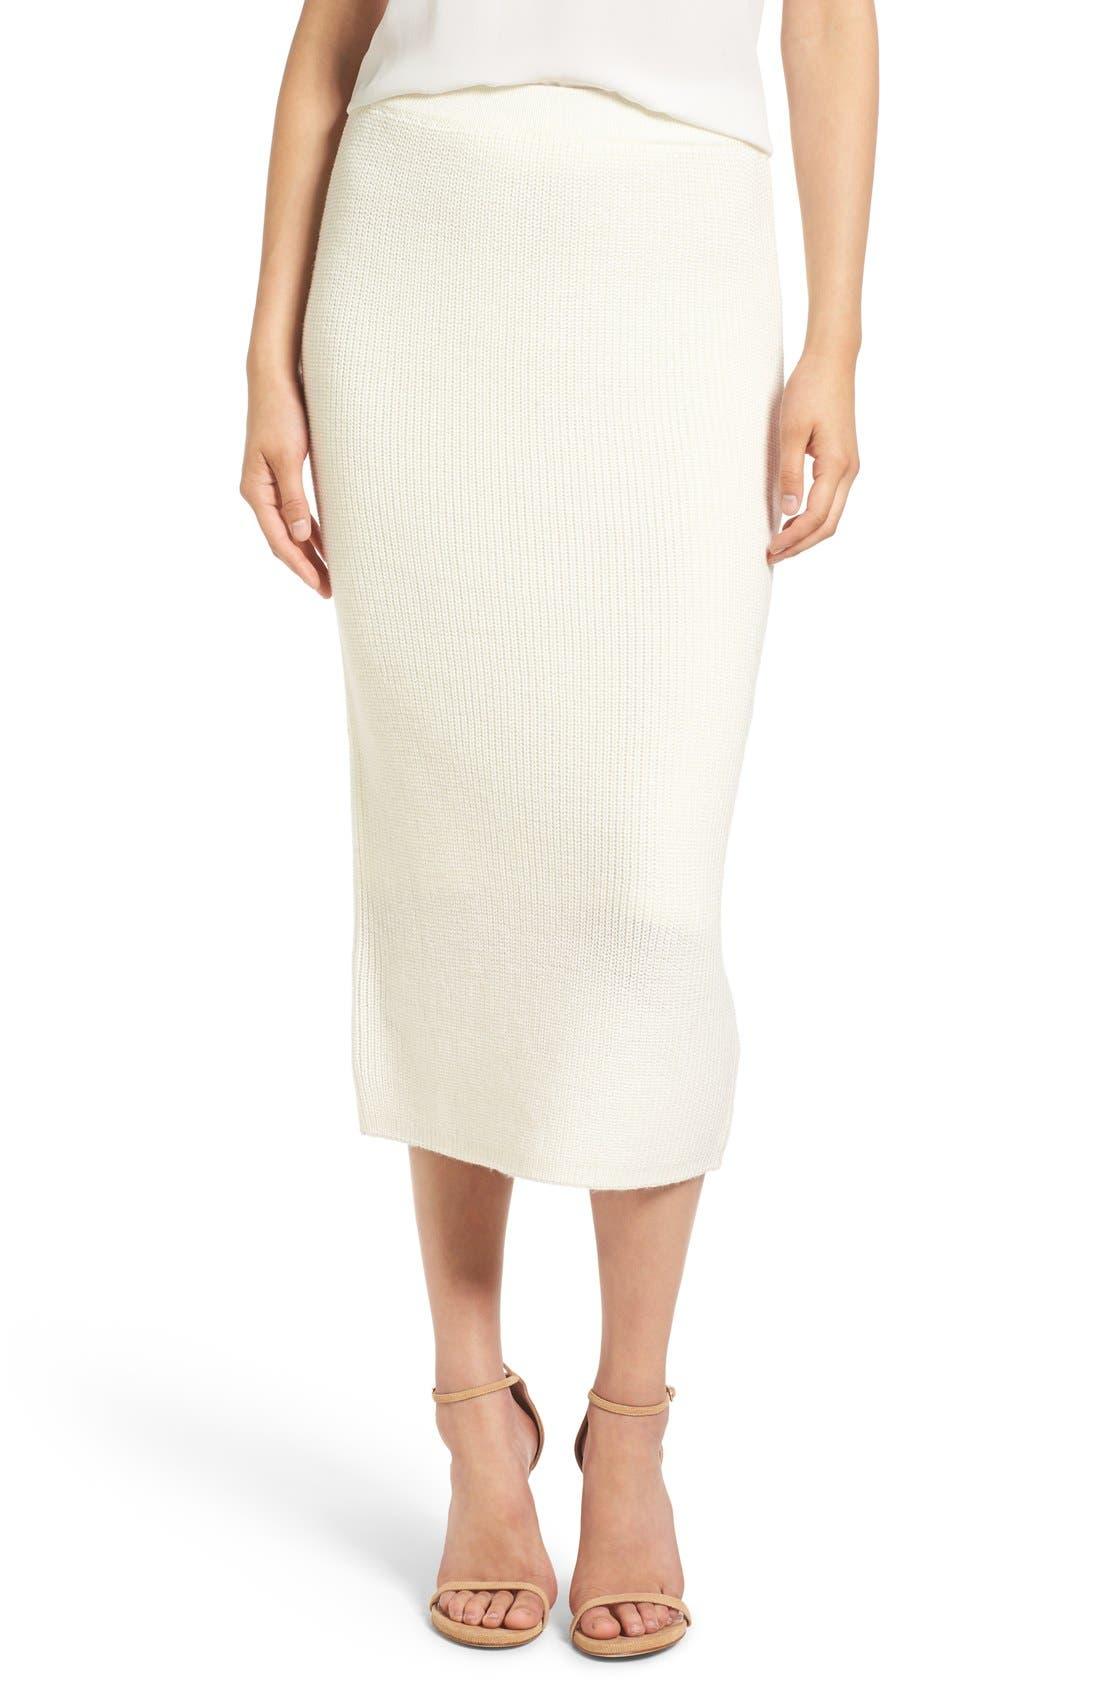 Main Image - Paper Crown by Lauren Conrad 'Copenhagen' Knit Tube Skirt